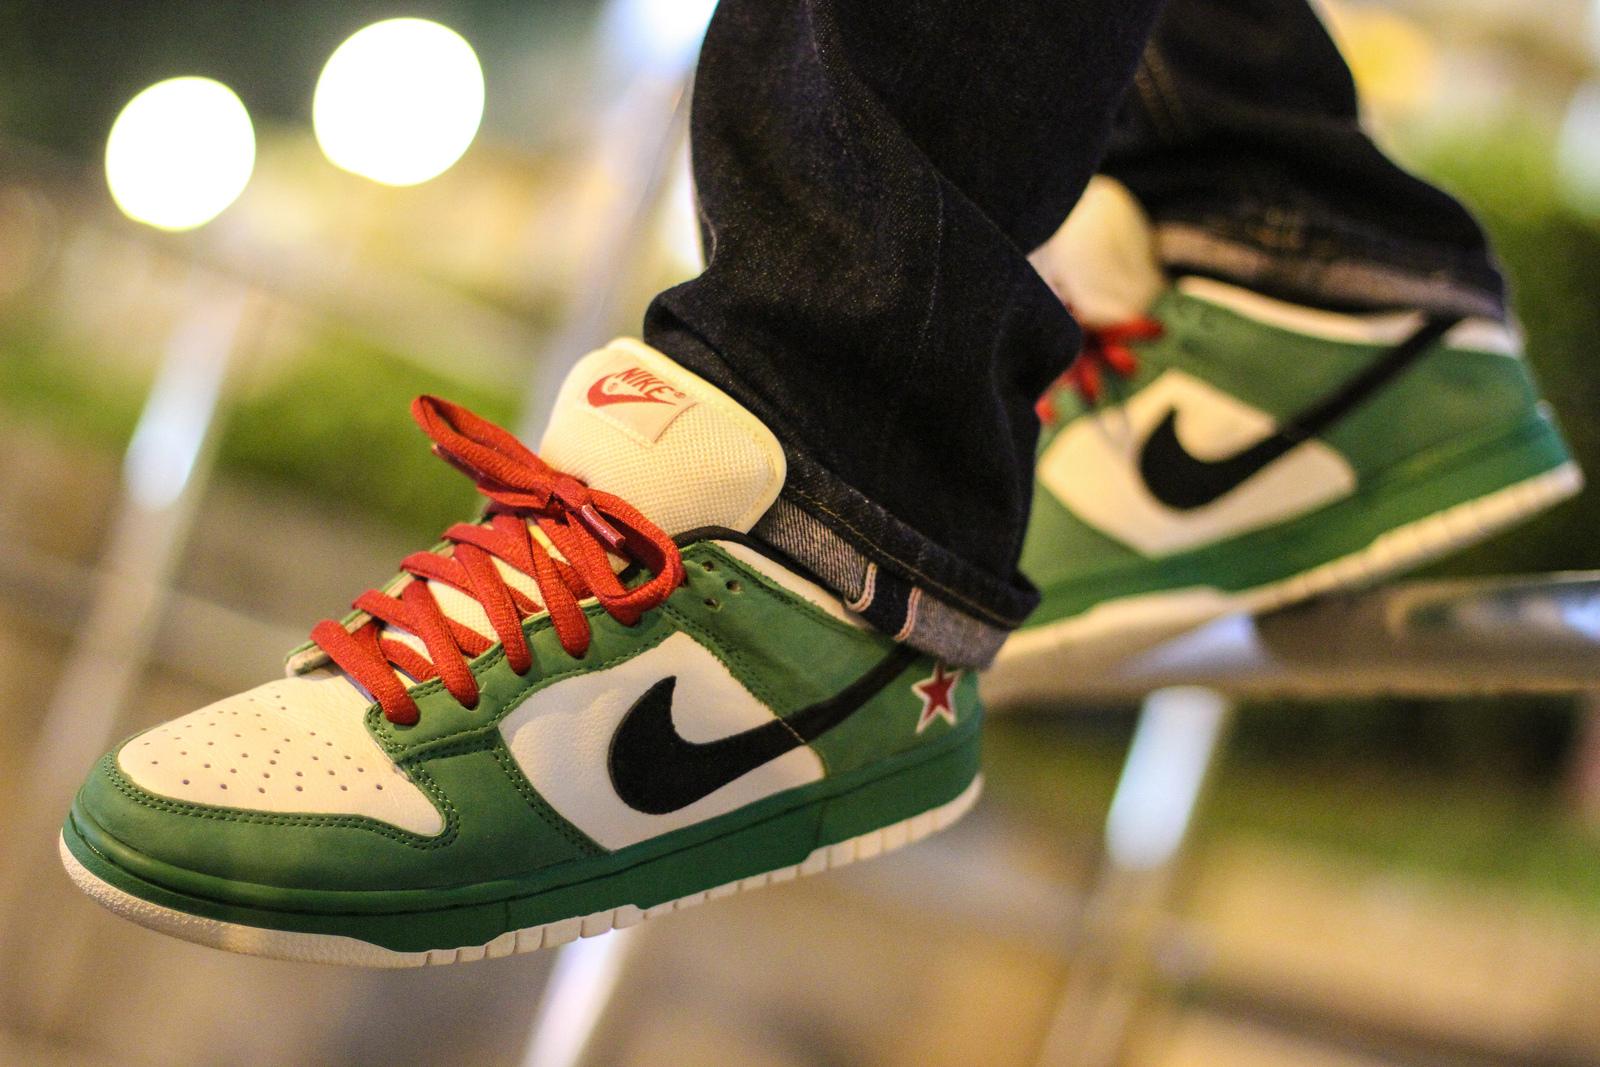 low priced 58fb0 1724f Top 10 Nike SB Kicks That Deserve a Retro Release   Green Label